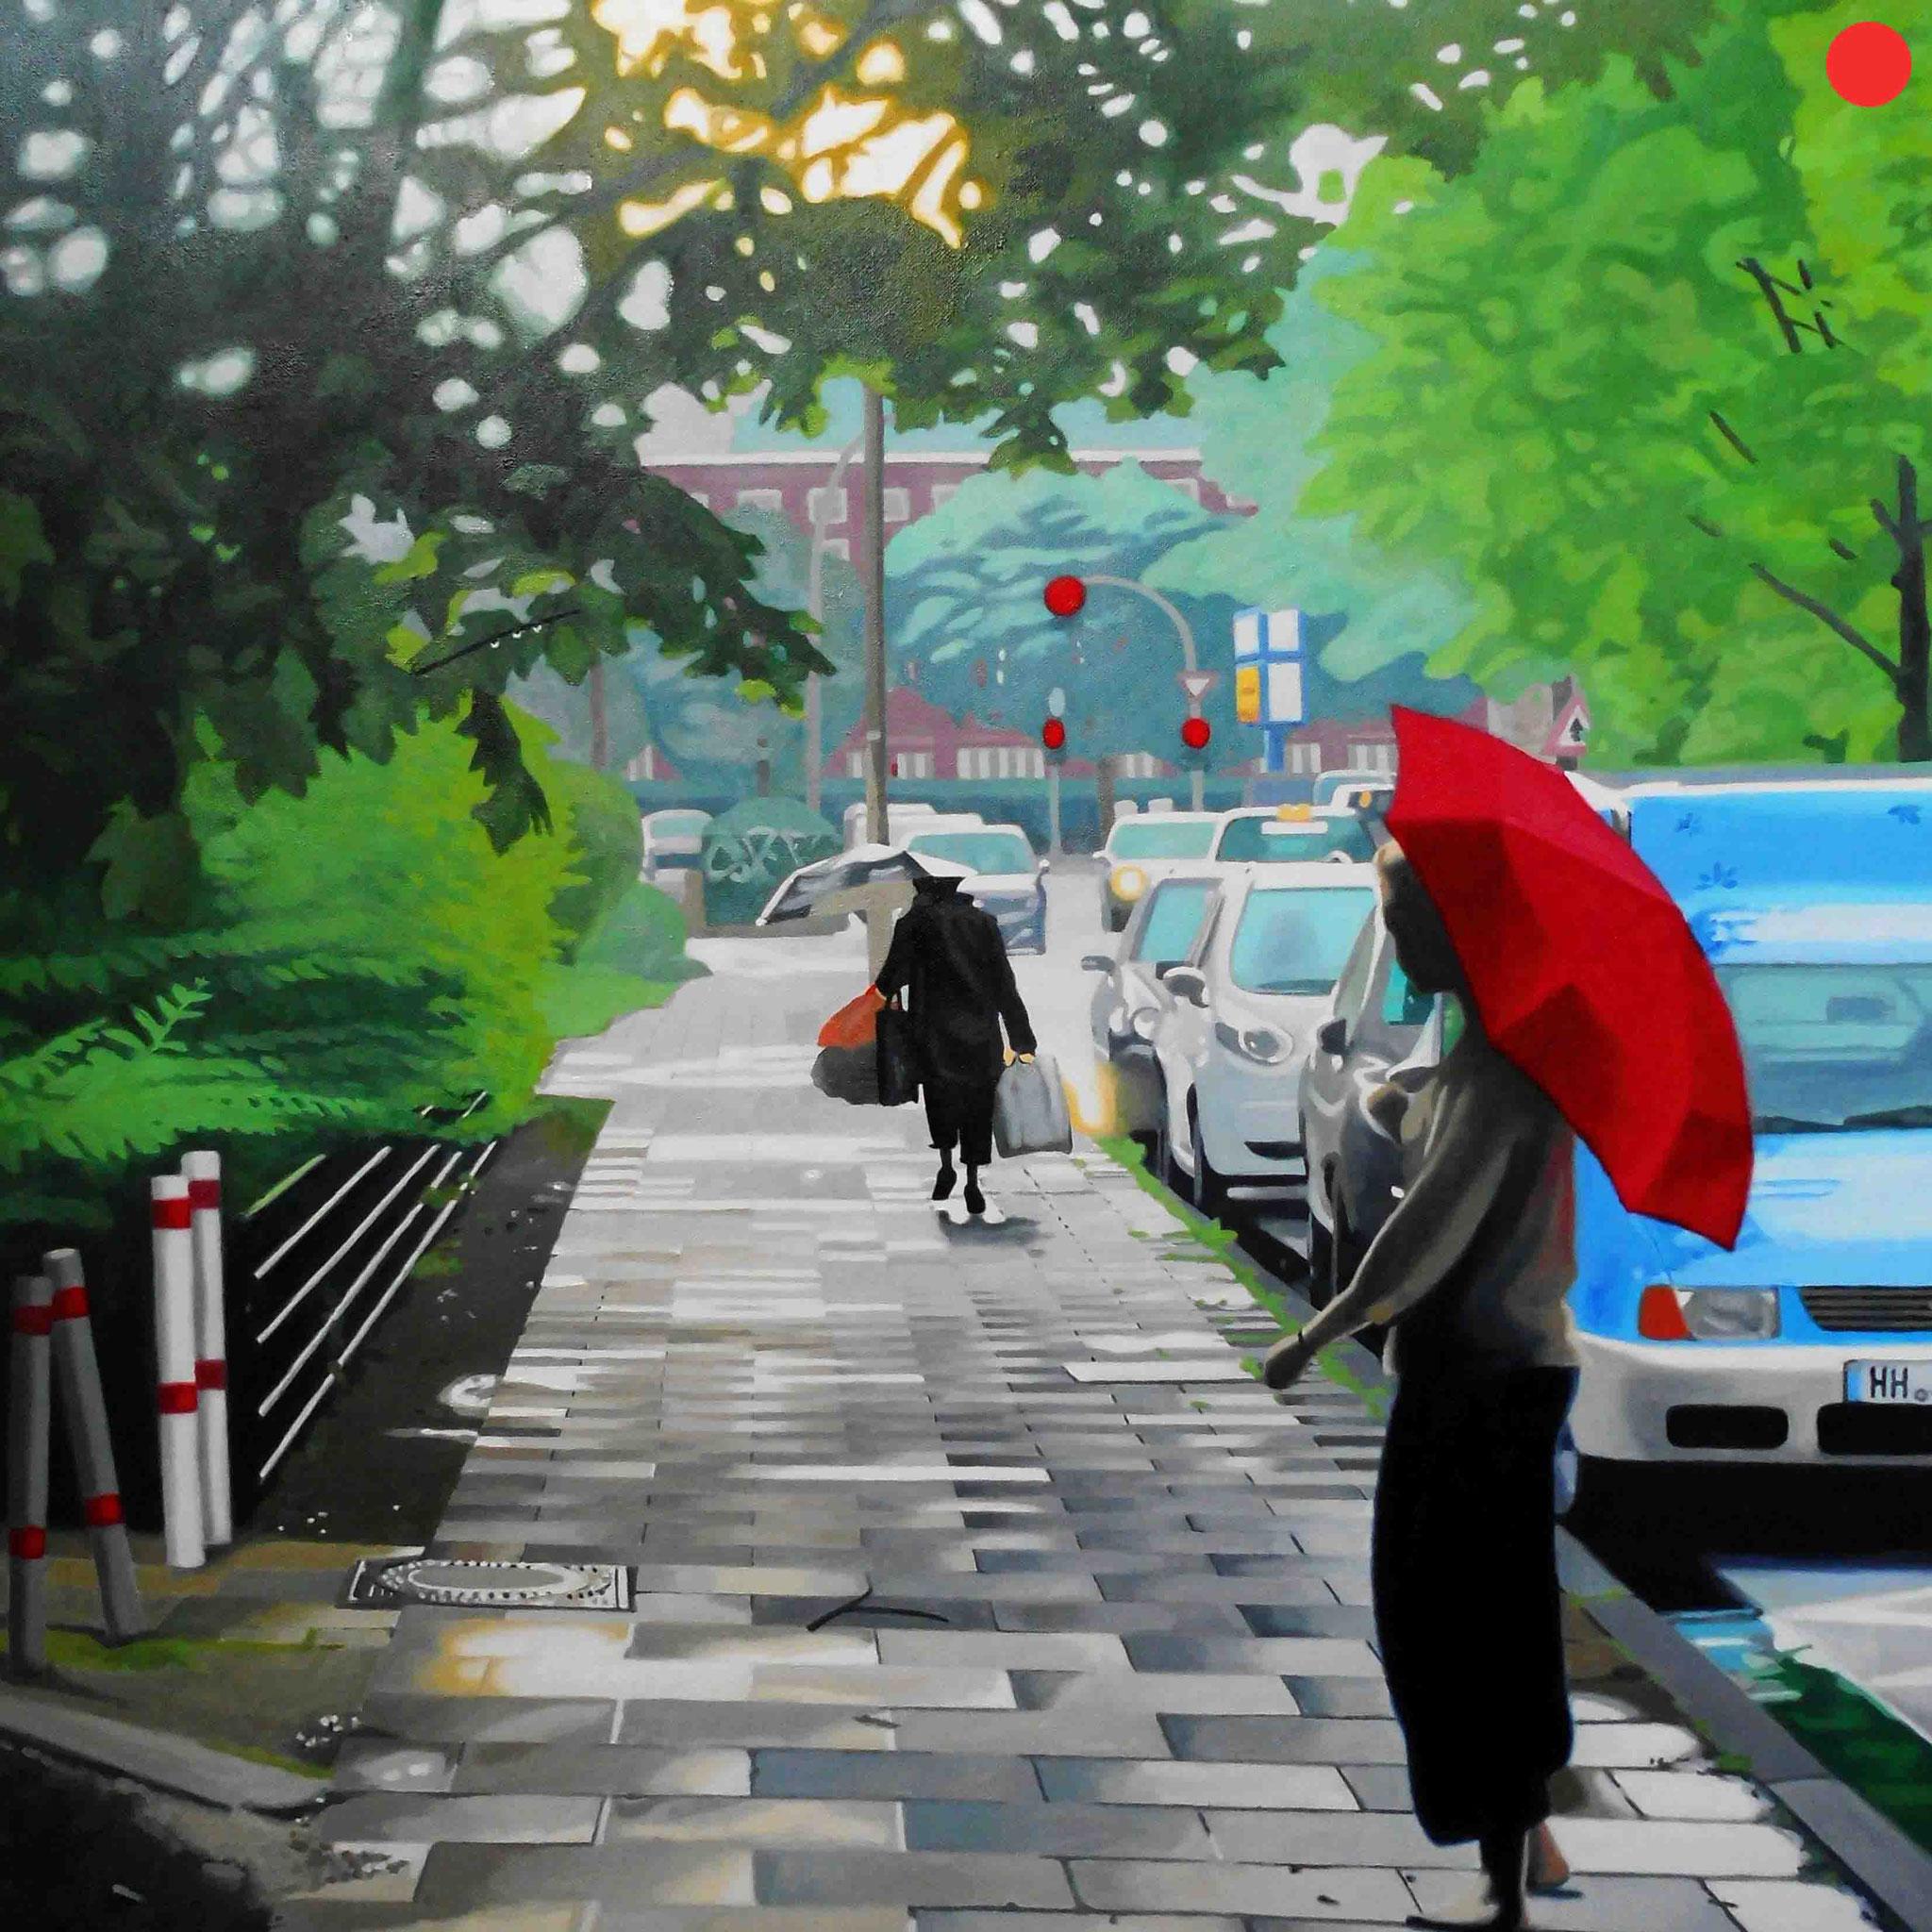 Regenstraße, Oil on Canvas, 100 x 100 cm